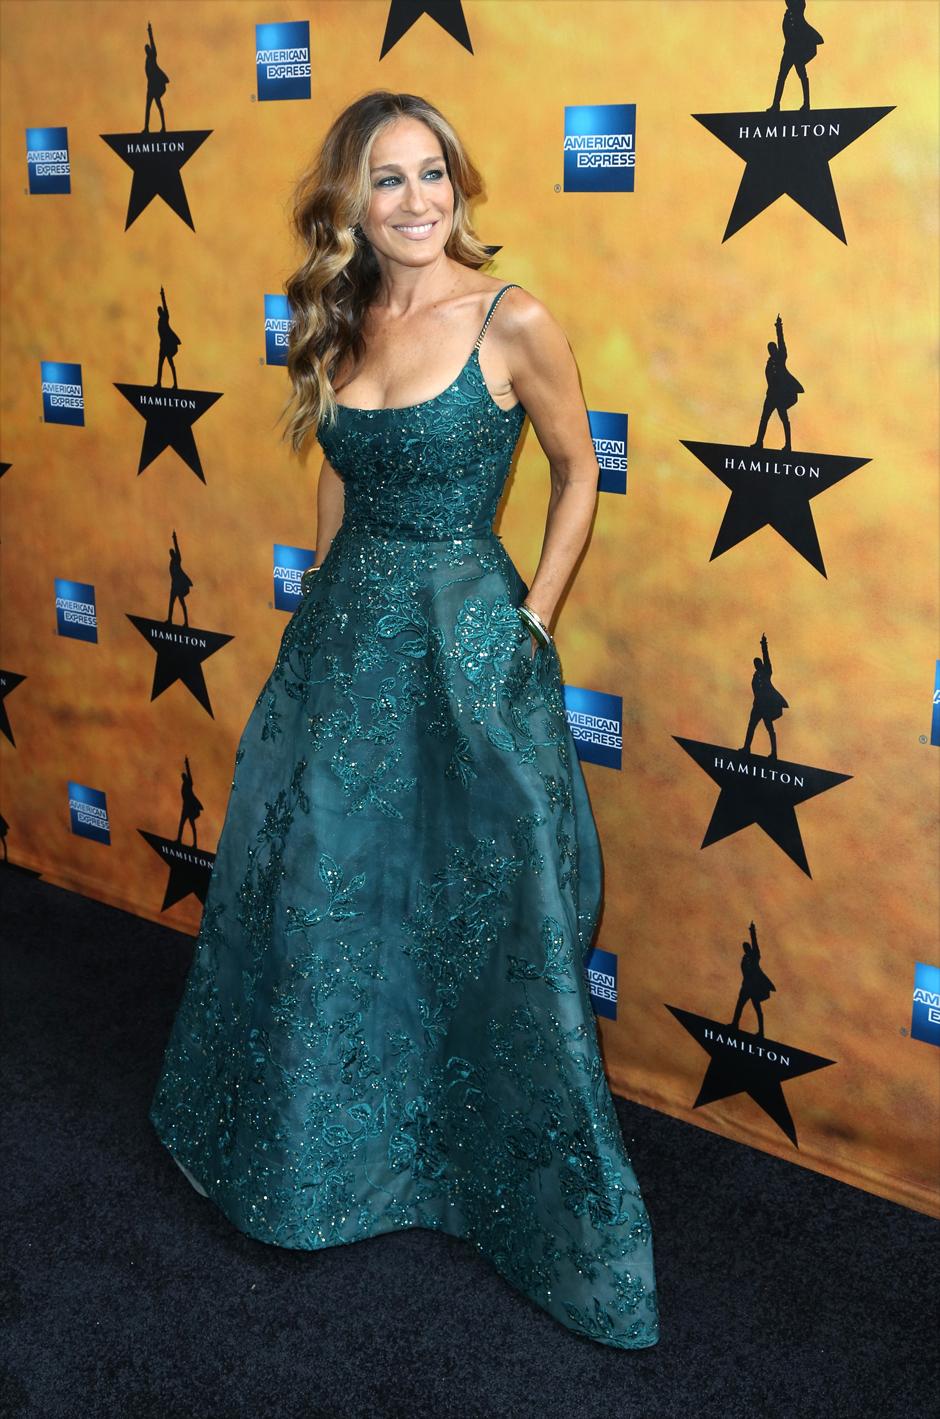 Сара Джессика Паркер на премьере мюзикла Hamilton в Нью-Йорке, 2015 год